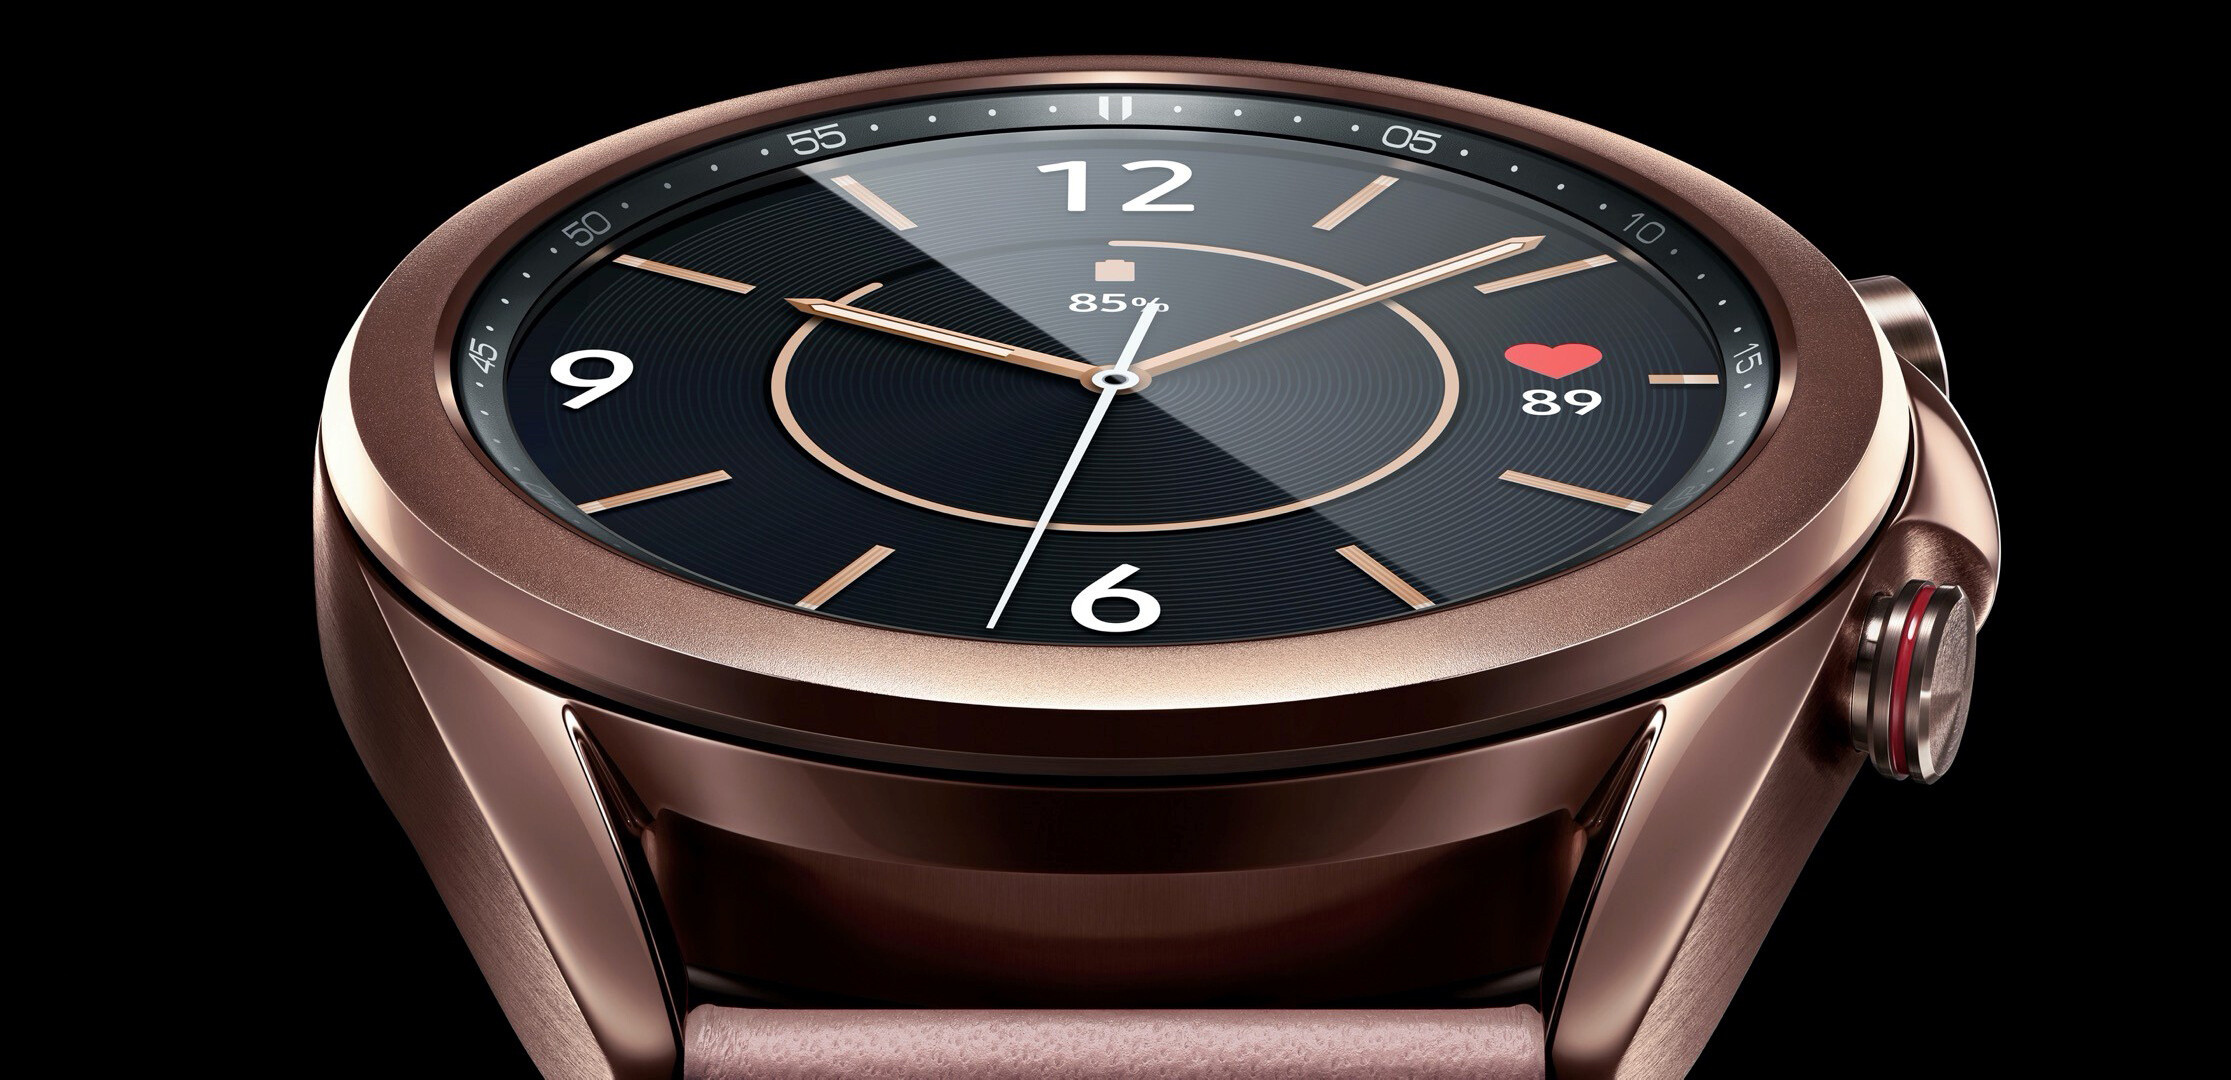 Samsung-Galaxy-Watch-3-leakage-makes-glasses-01.jpg